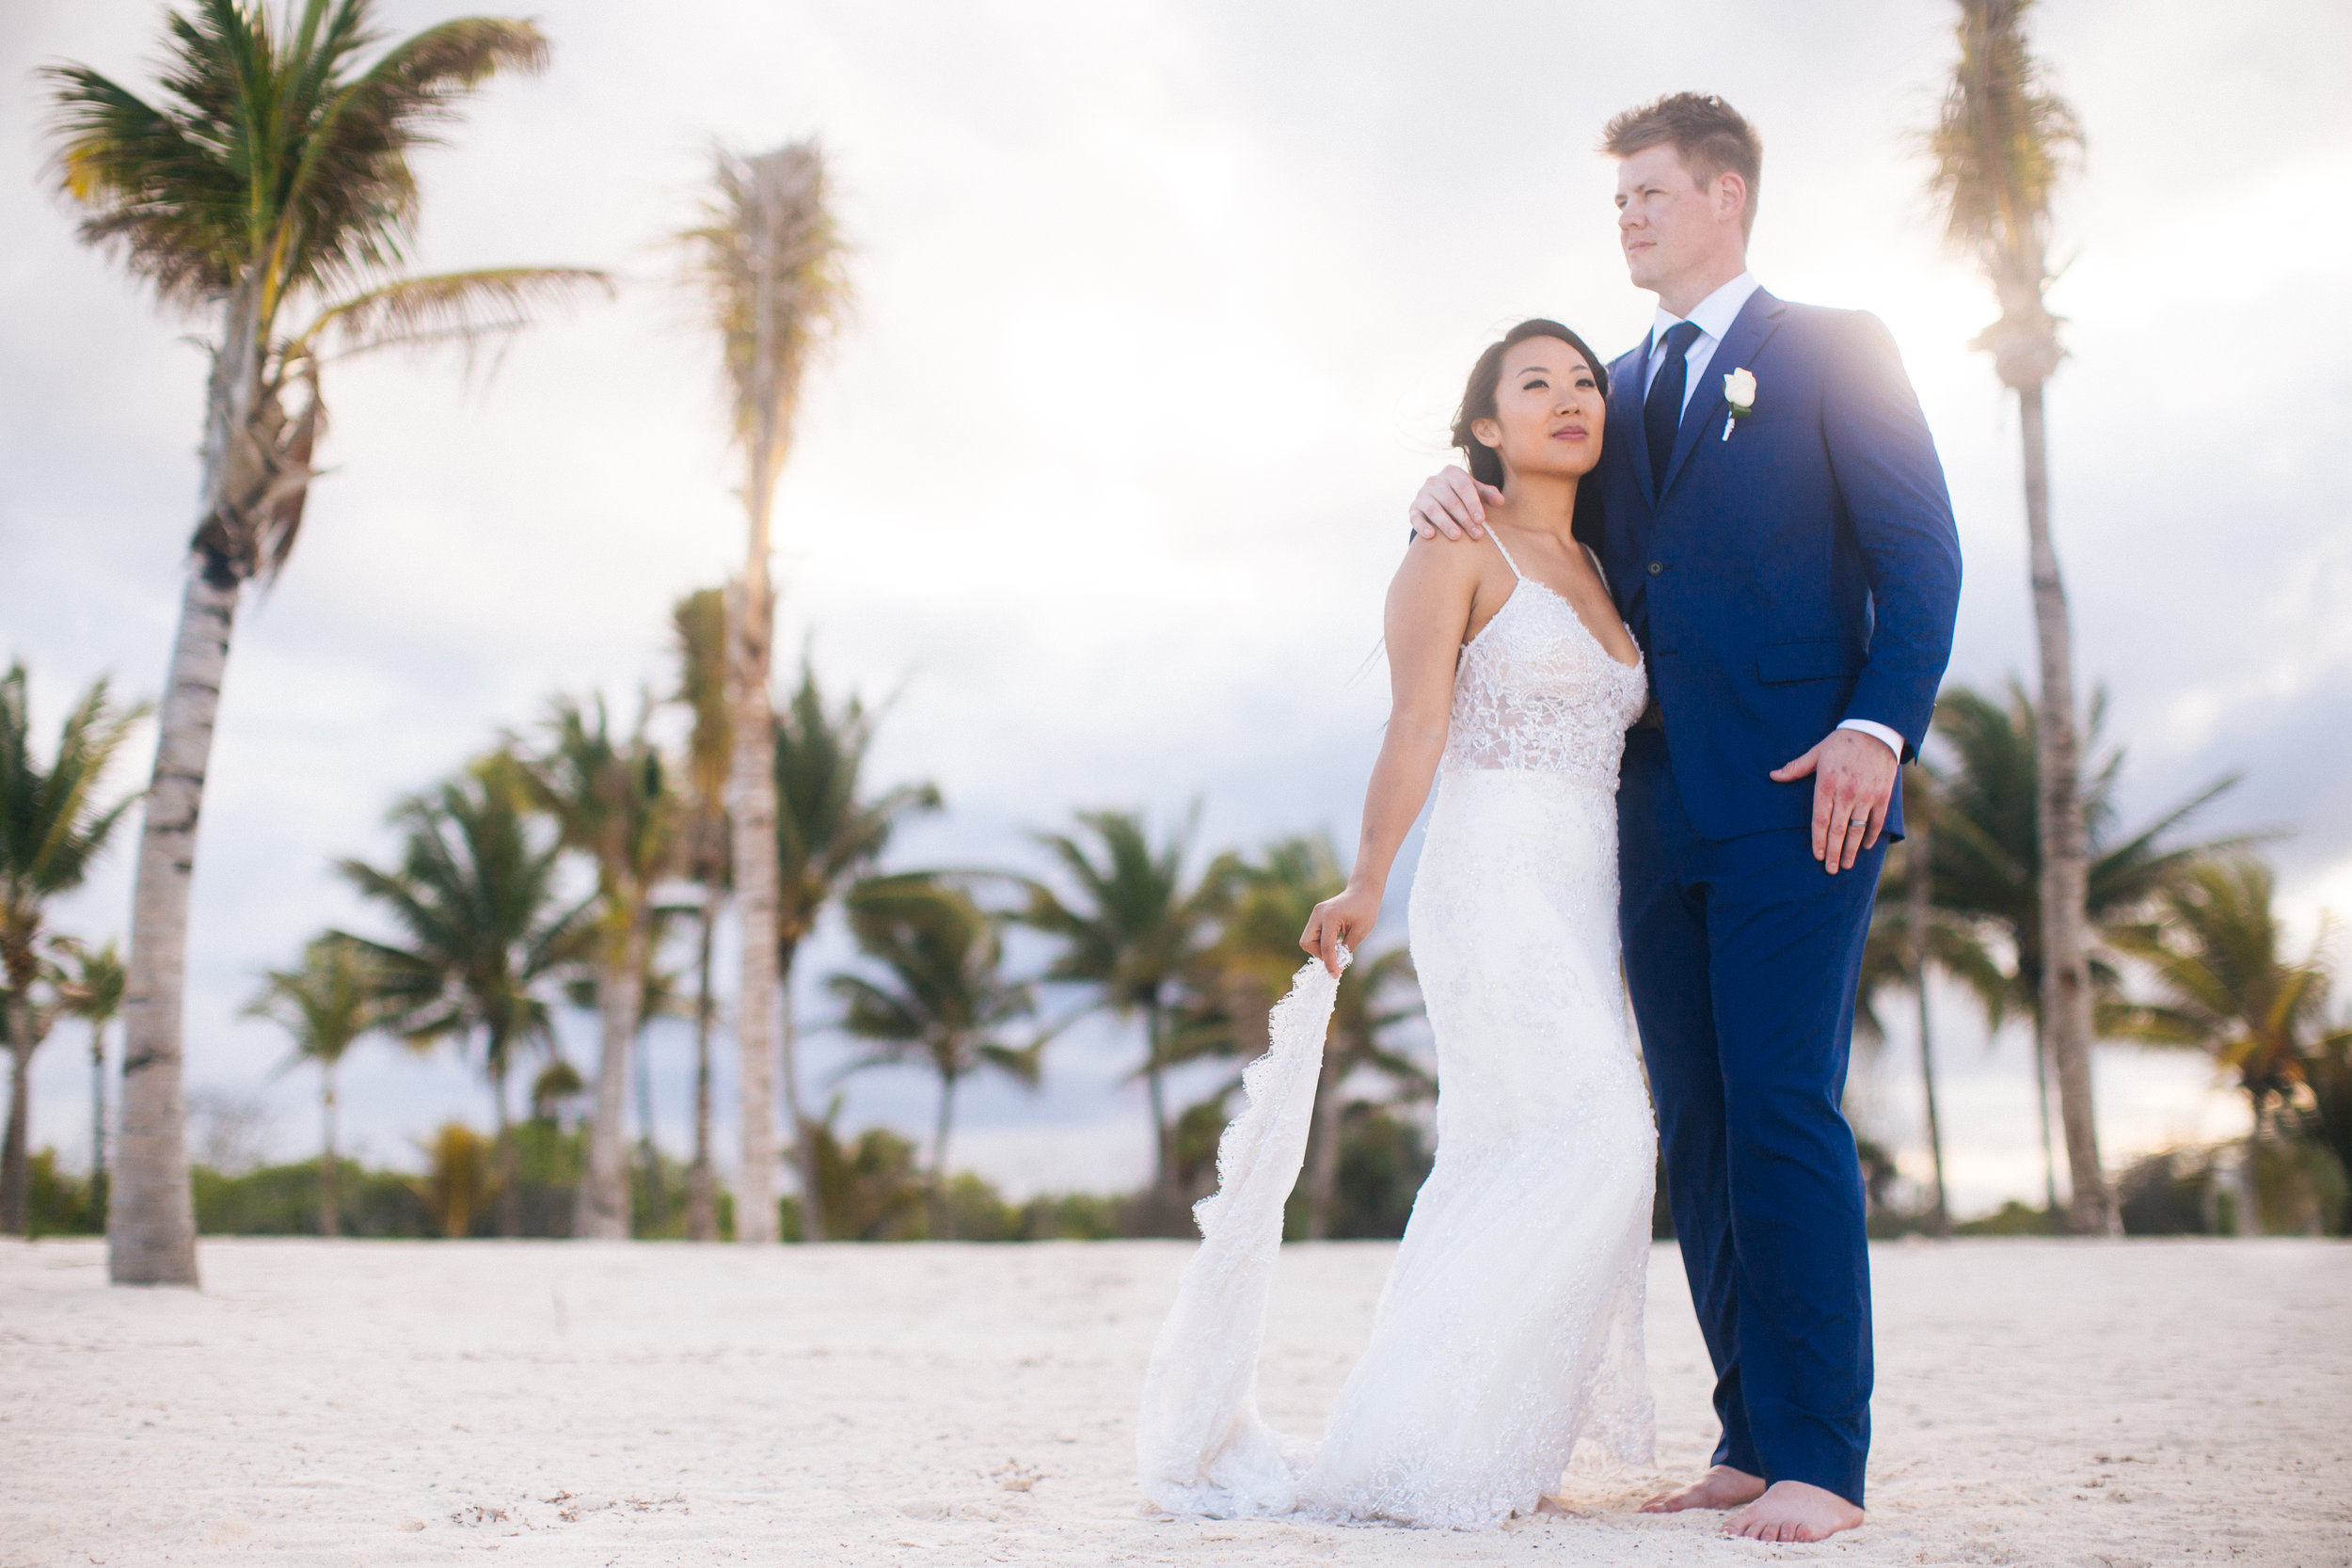 Gorgeous Mexico Sunset Wedding Photo